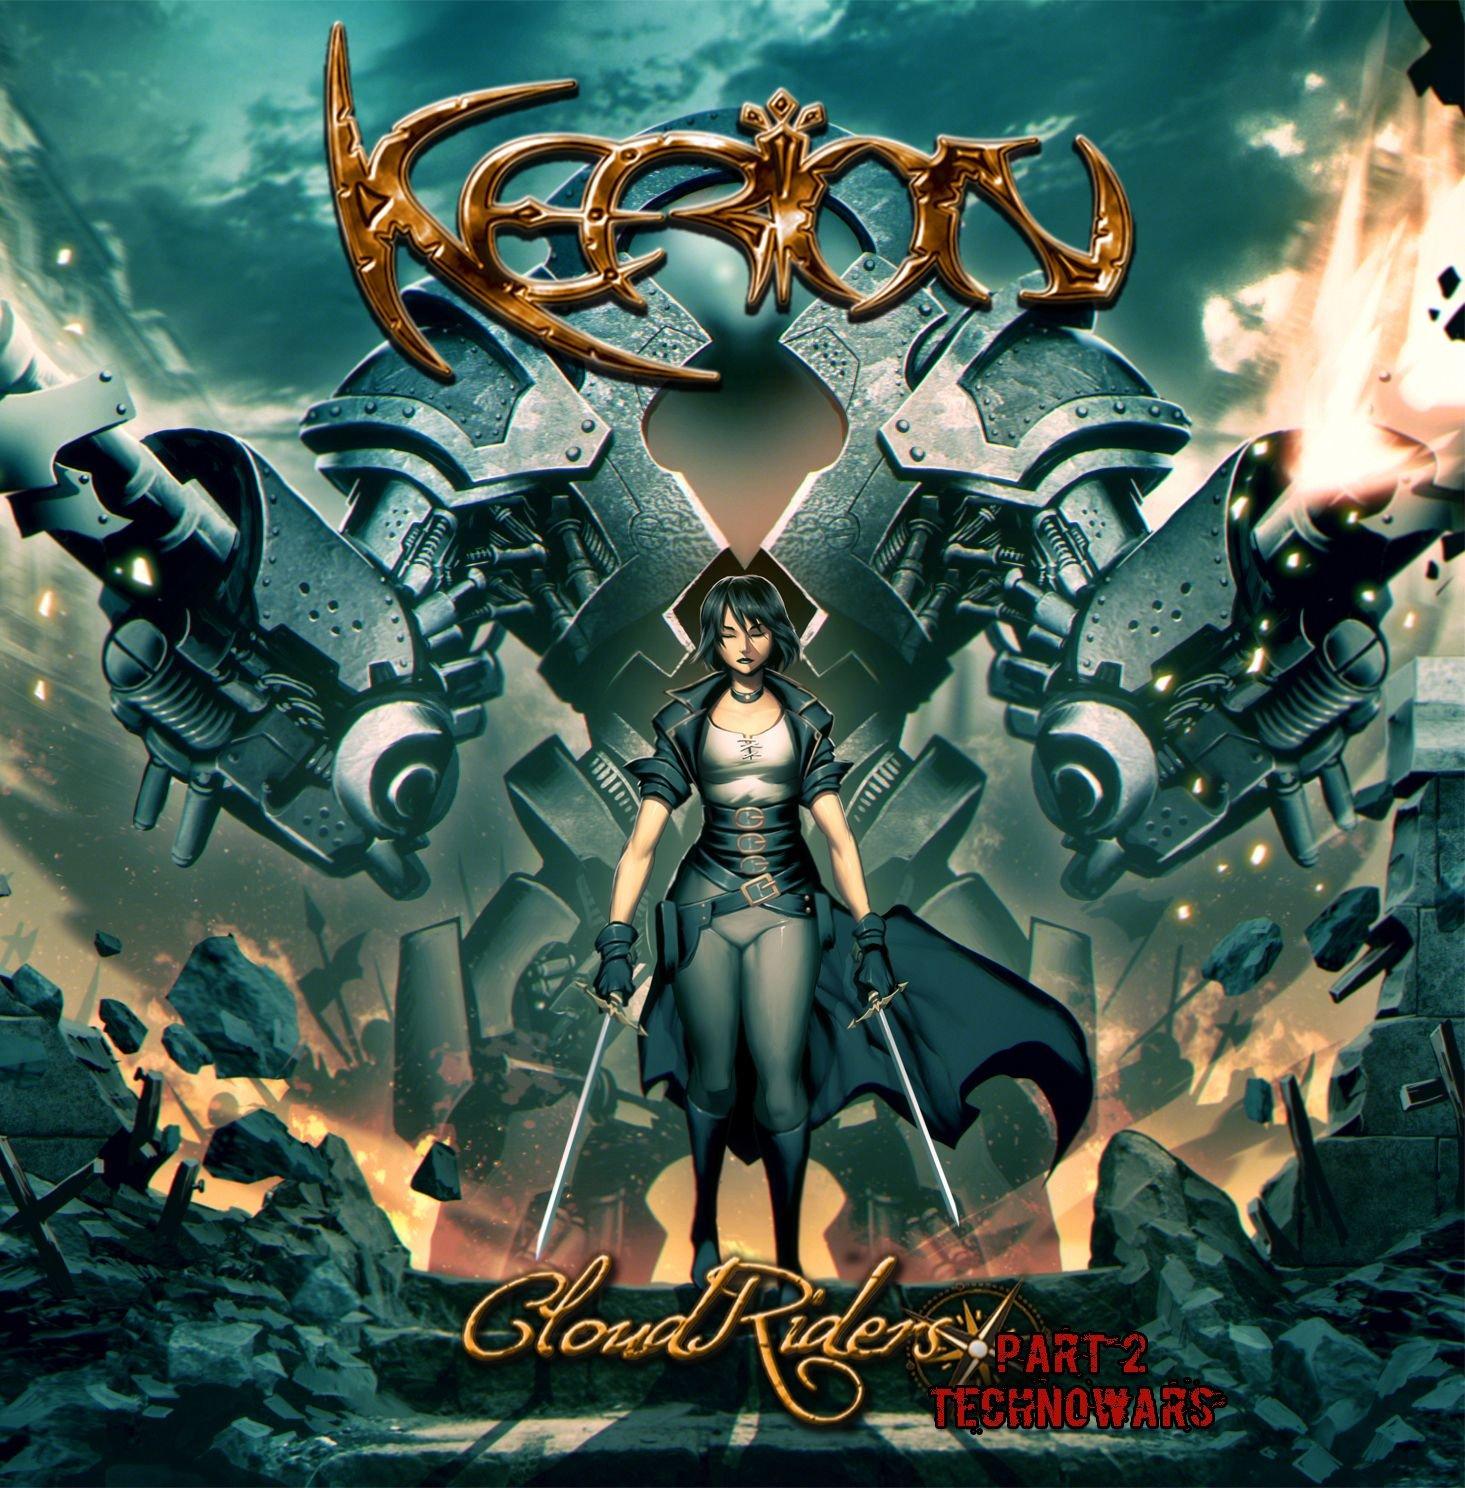 "KERION ""Cloud Riders, Pt. 2: Technowars"" (OCT 2015) 81kWVYQDS4L._SL1488_"